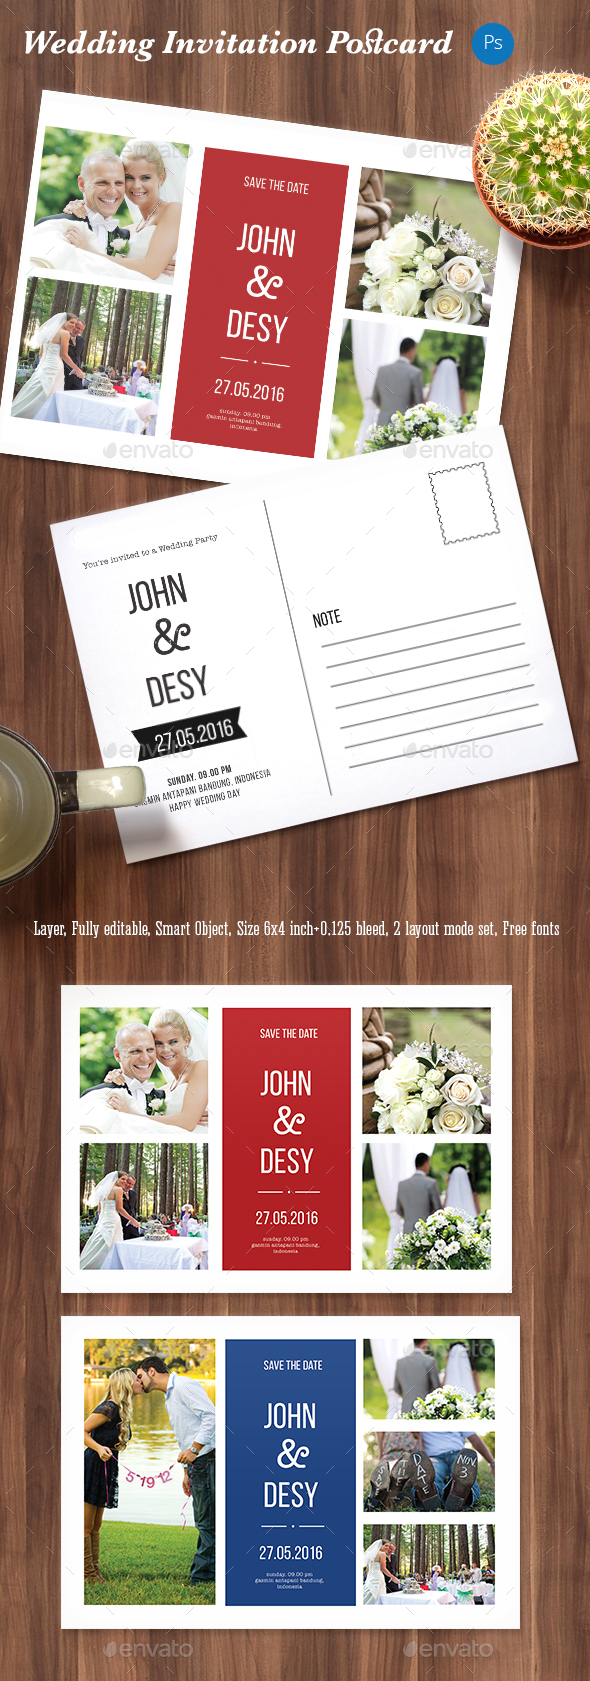 Simpel Wedding Invitation - Weddings Cards & Invites